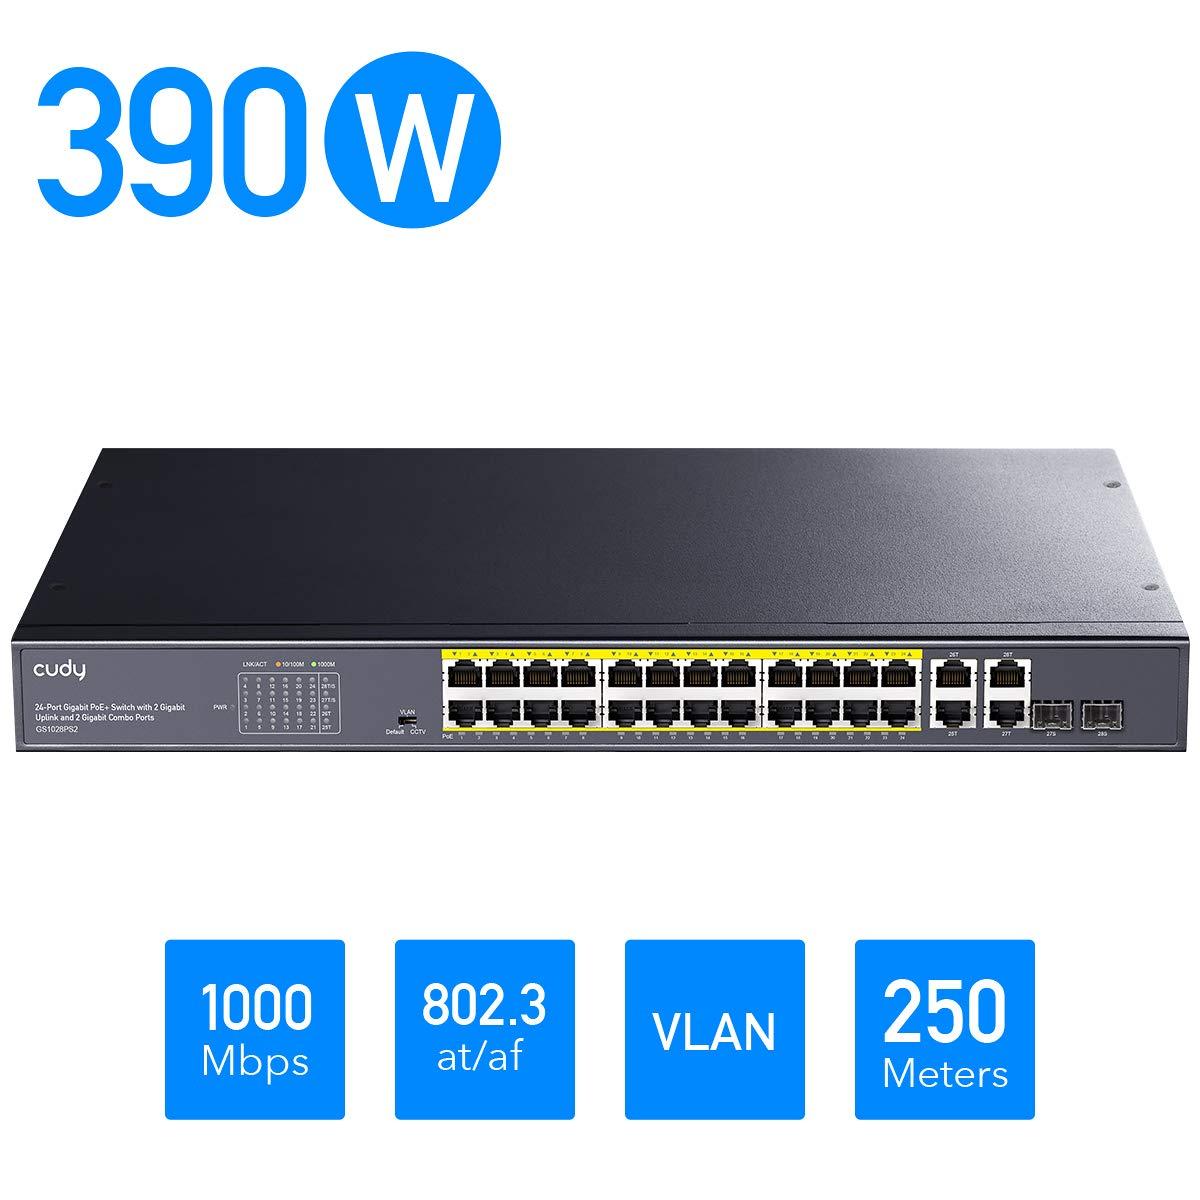 Cudy GS1028PS2 24+4-Port Gigabit Ethernet Unmanaged PoE+ Switch, 390W, 24 100/1000Mbps PoE+ Ports, 2 Gigabit SFP Combo, CCTV/VLAN Mode, 19-inch Rackmount, 802.3af/at